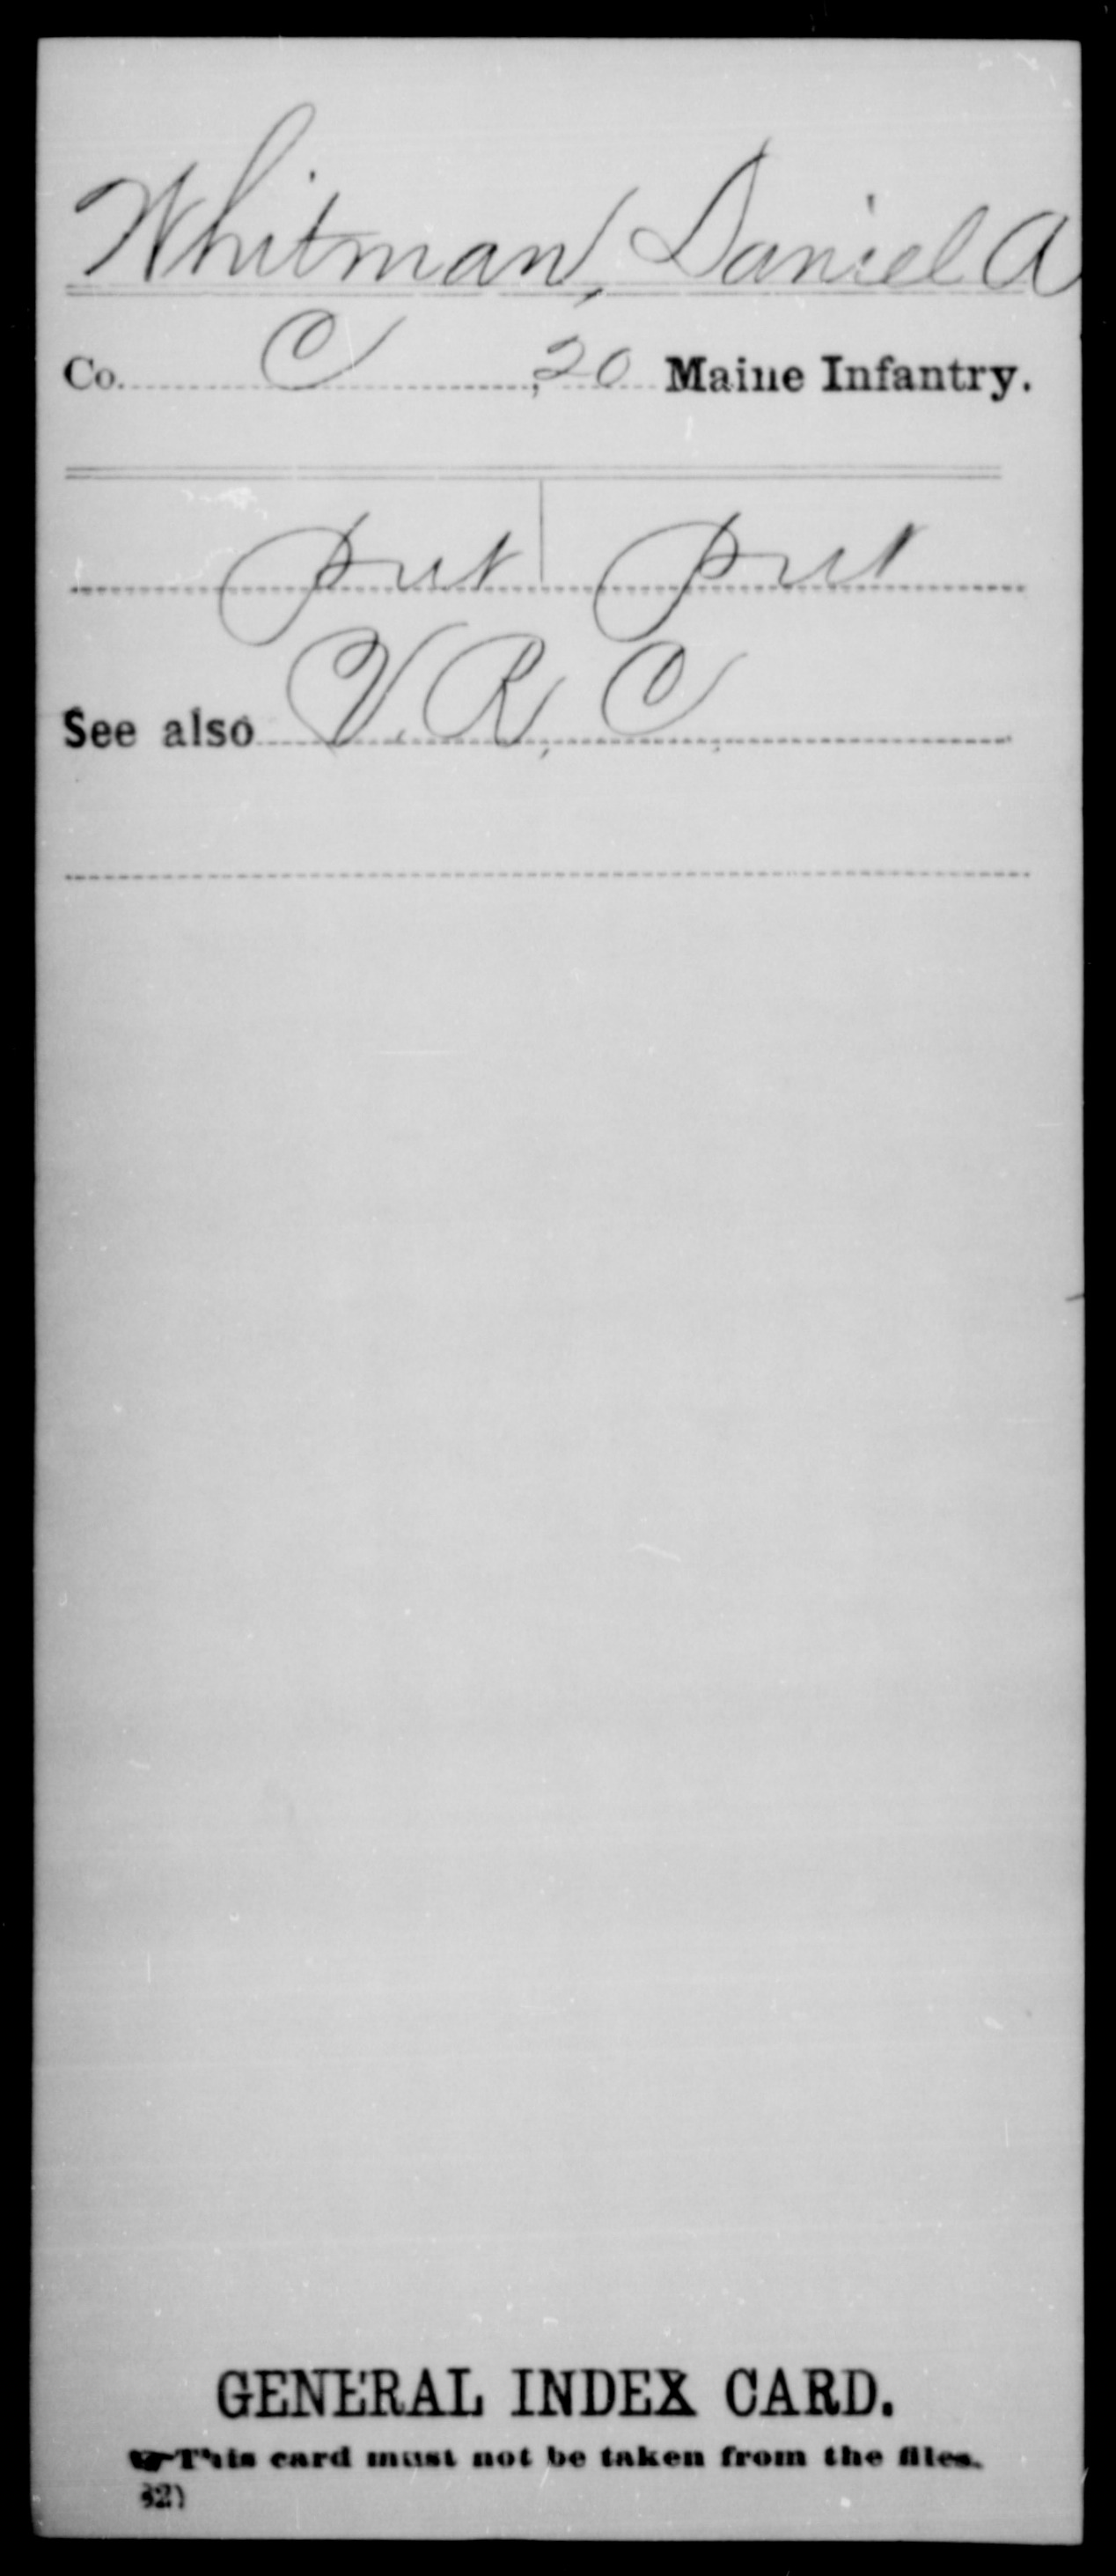 [Maine] Whitman, Danie; A - 20th Infantry, Company C